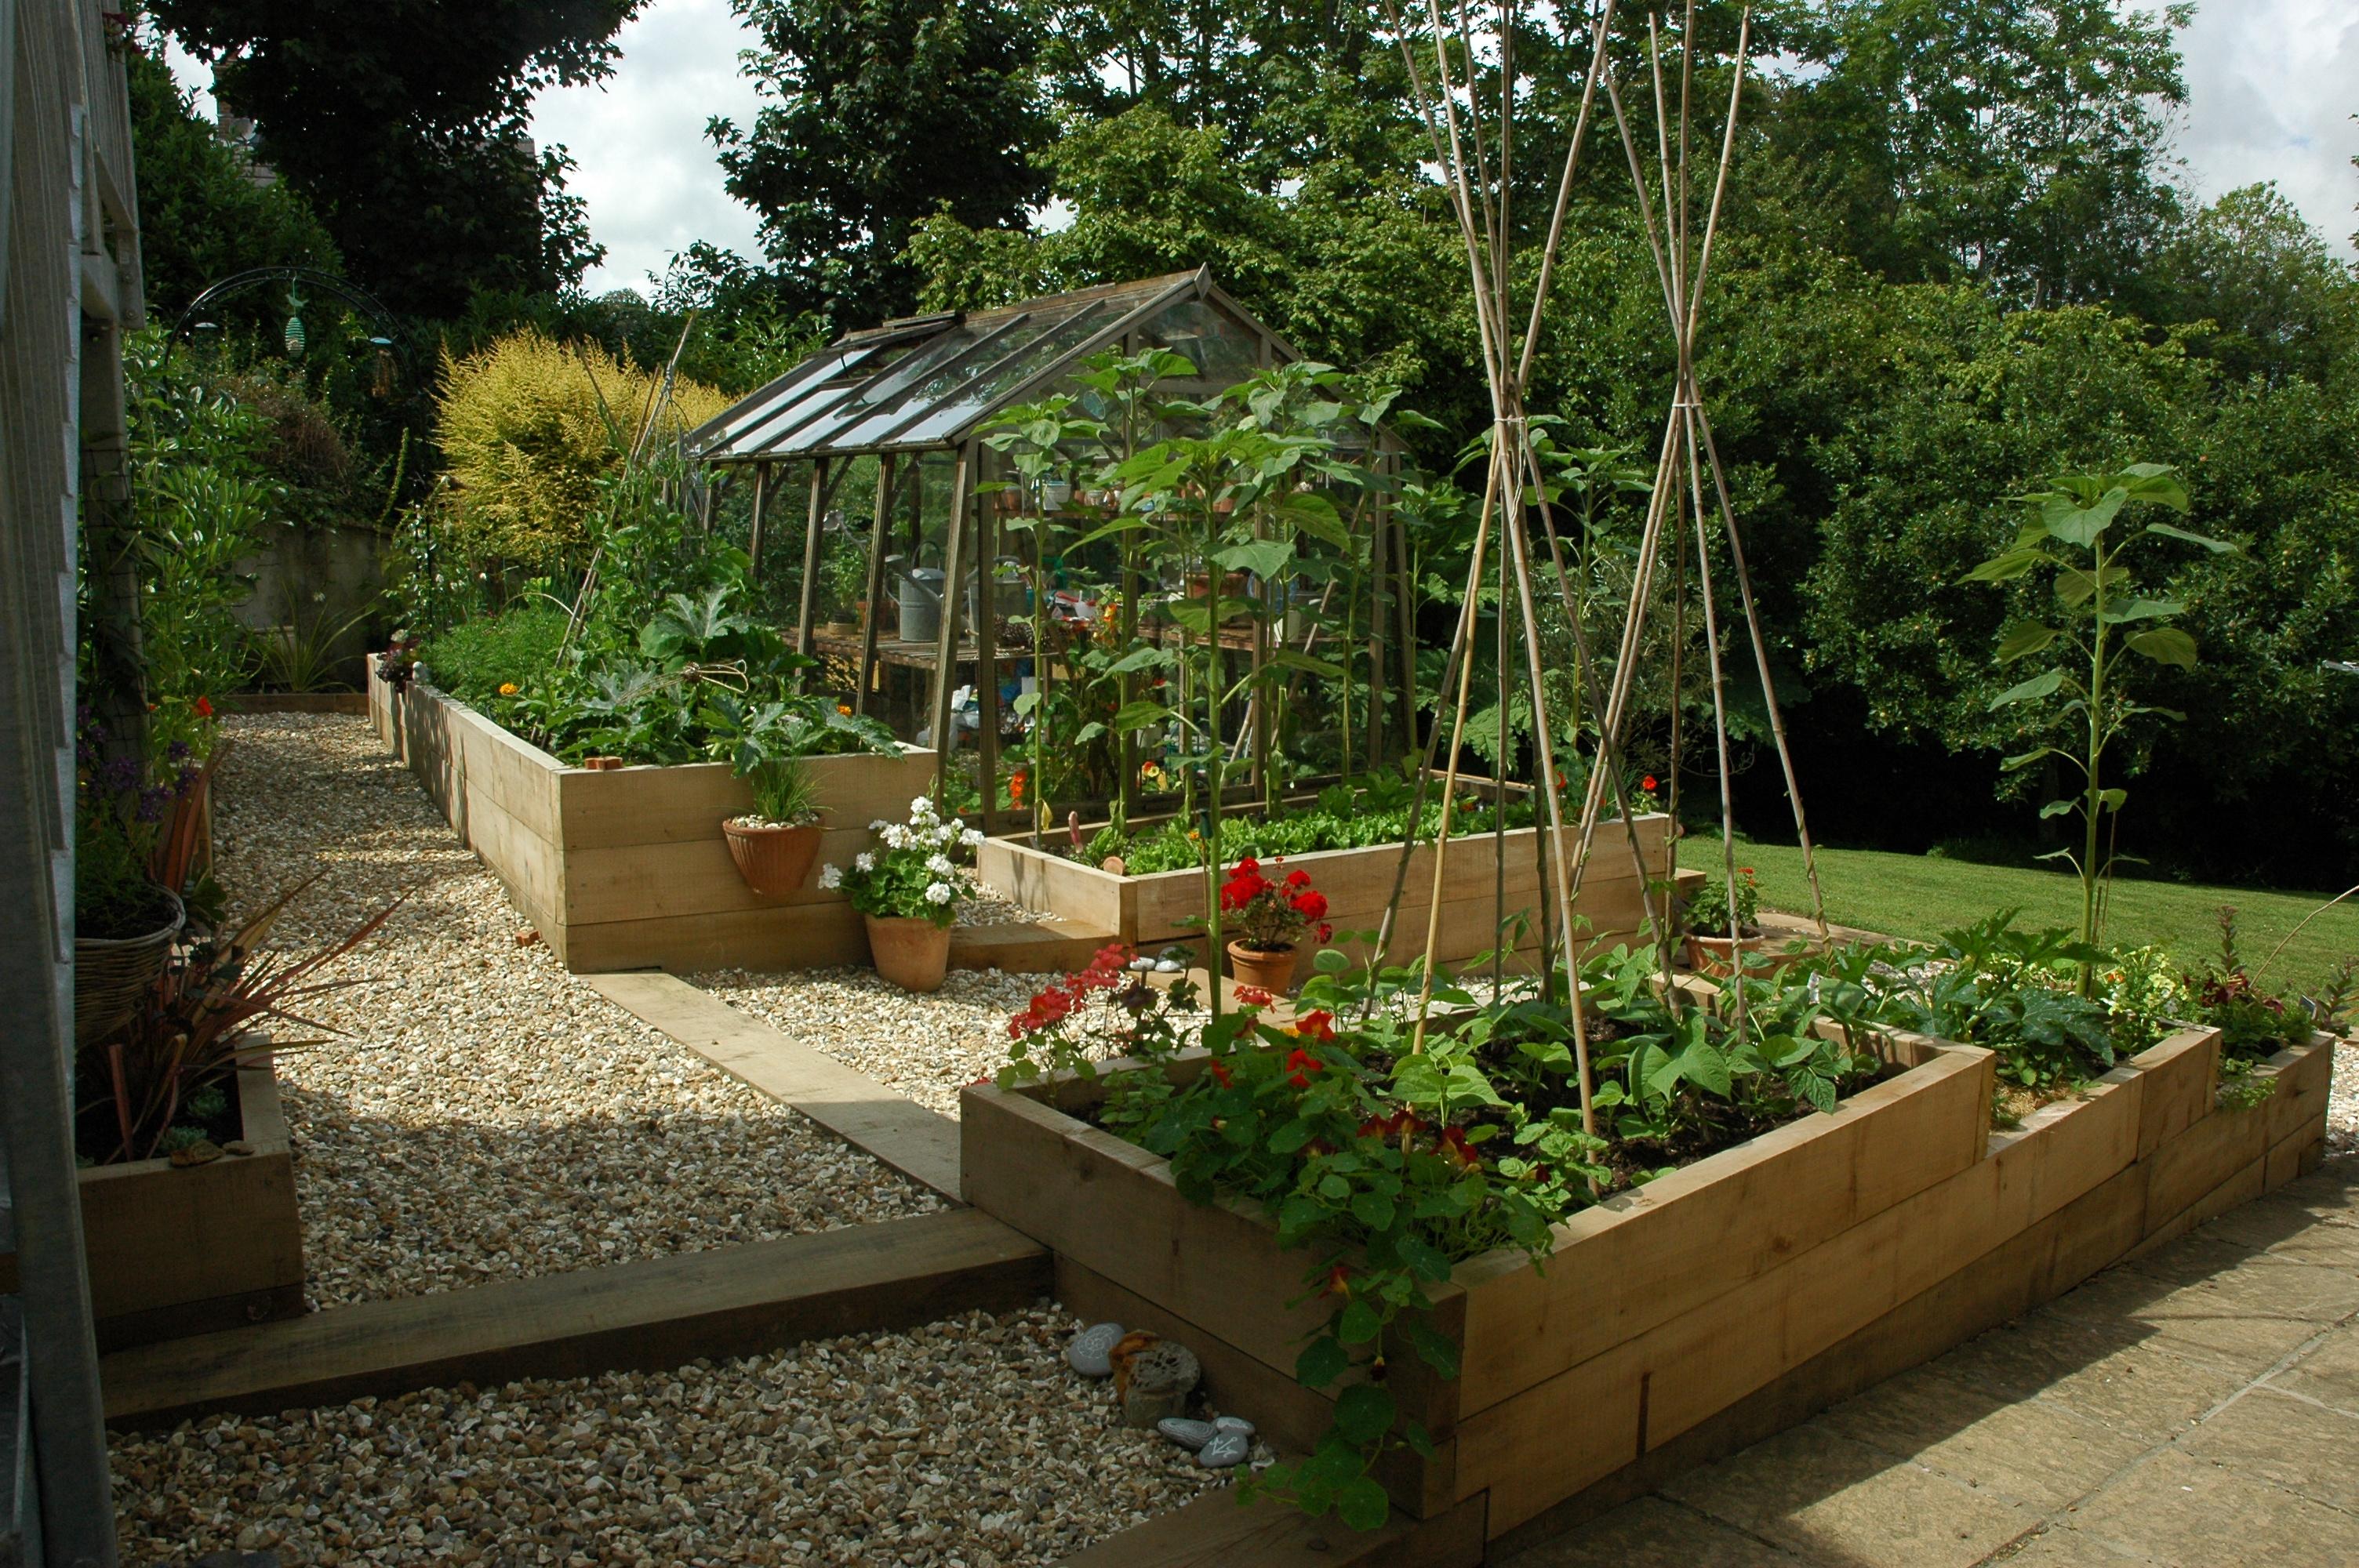 A modern potager alice meacham garden design for Potager garden designs